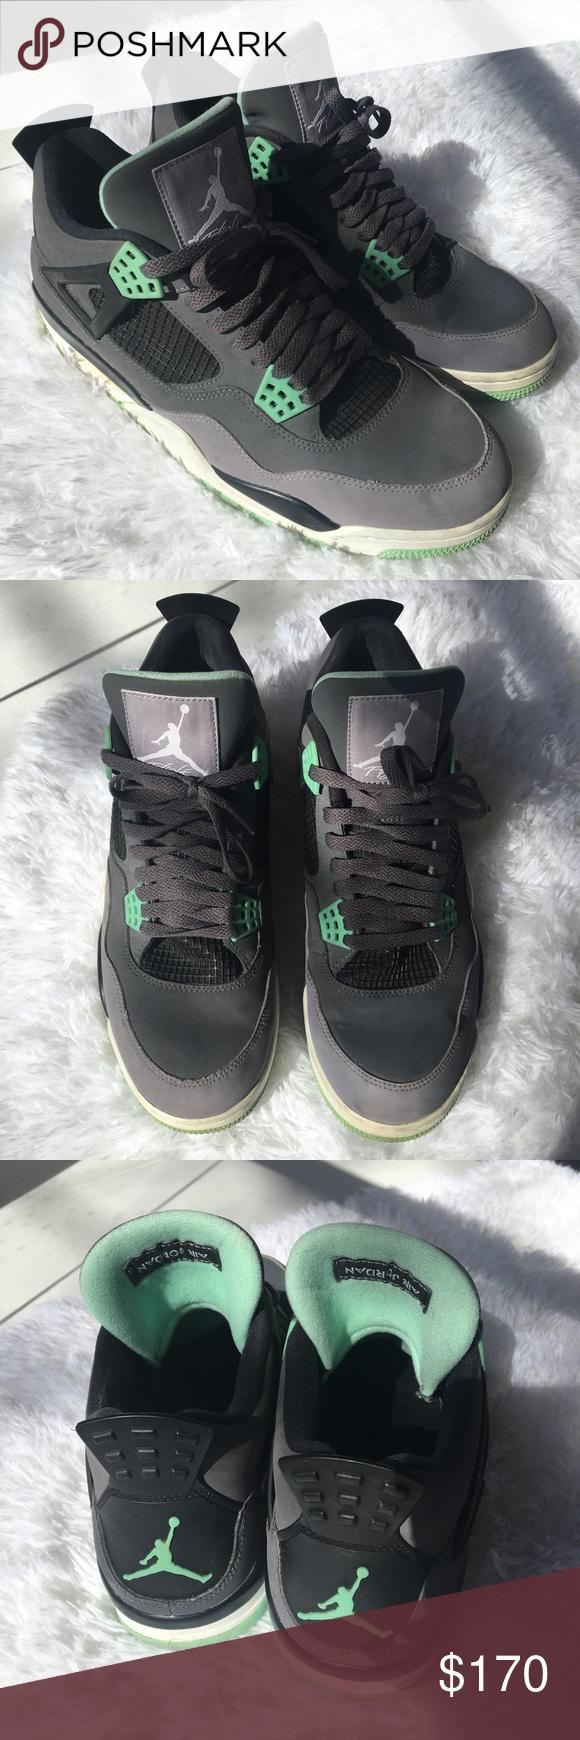 c7ebaf0109c4 Nike Air Jordan IV 4 Retro GREEN GLOW 308497 033 Nike Air Jordan IV 4 Retro